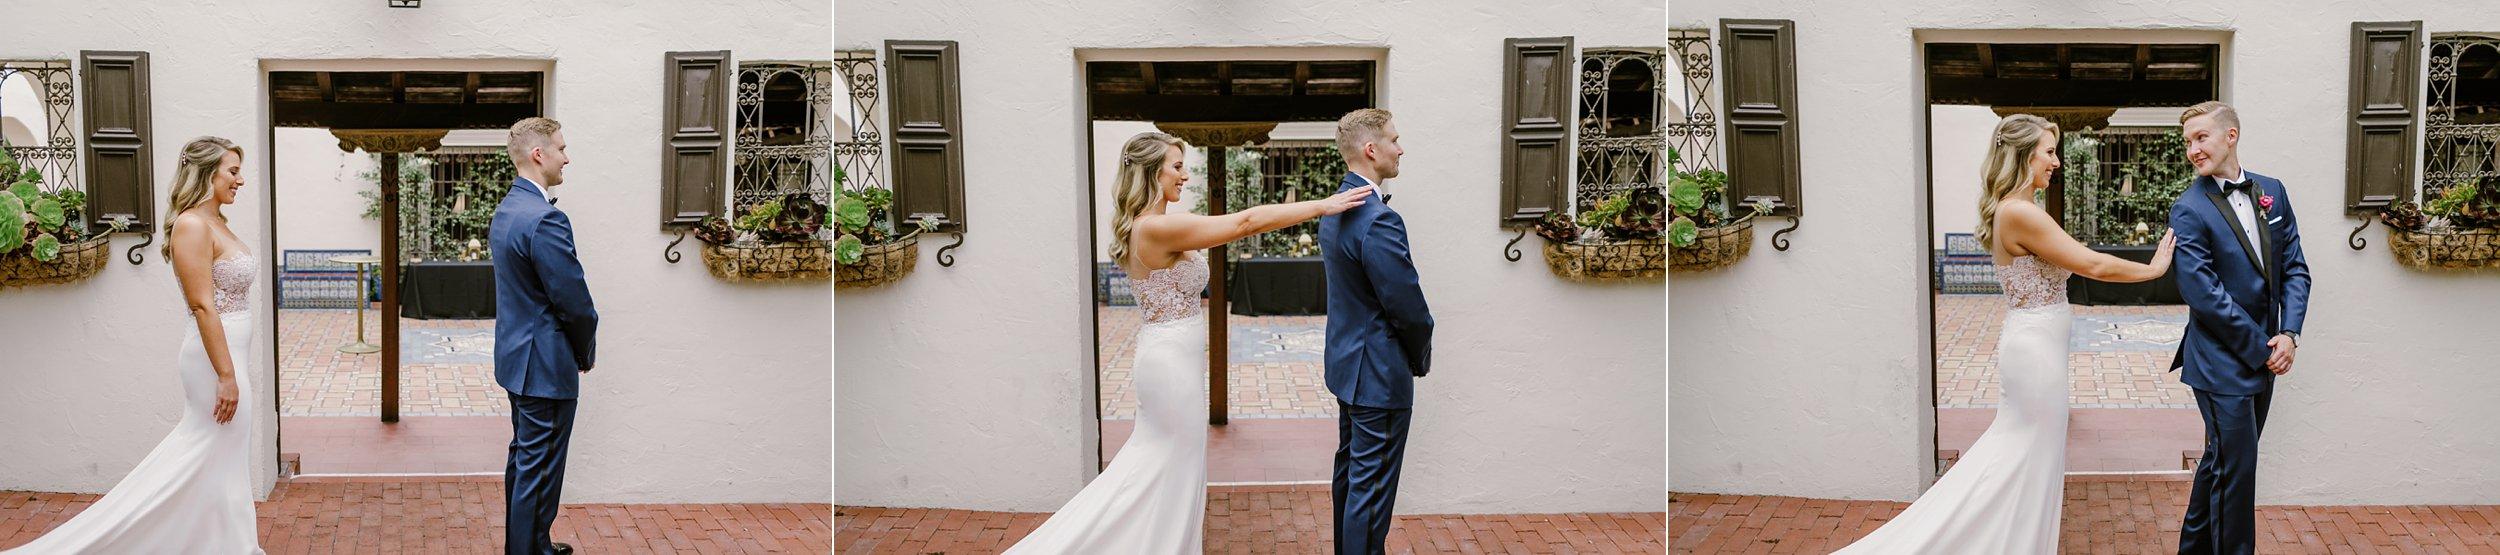 Briana and Sean Darlington House La Jolla Wedding_0015.jpg